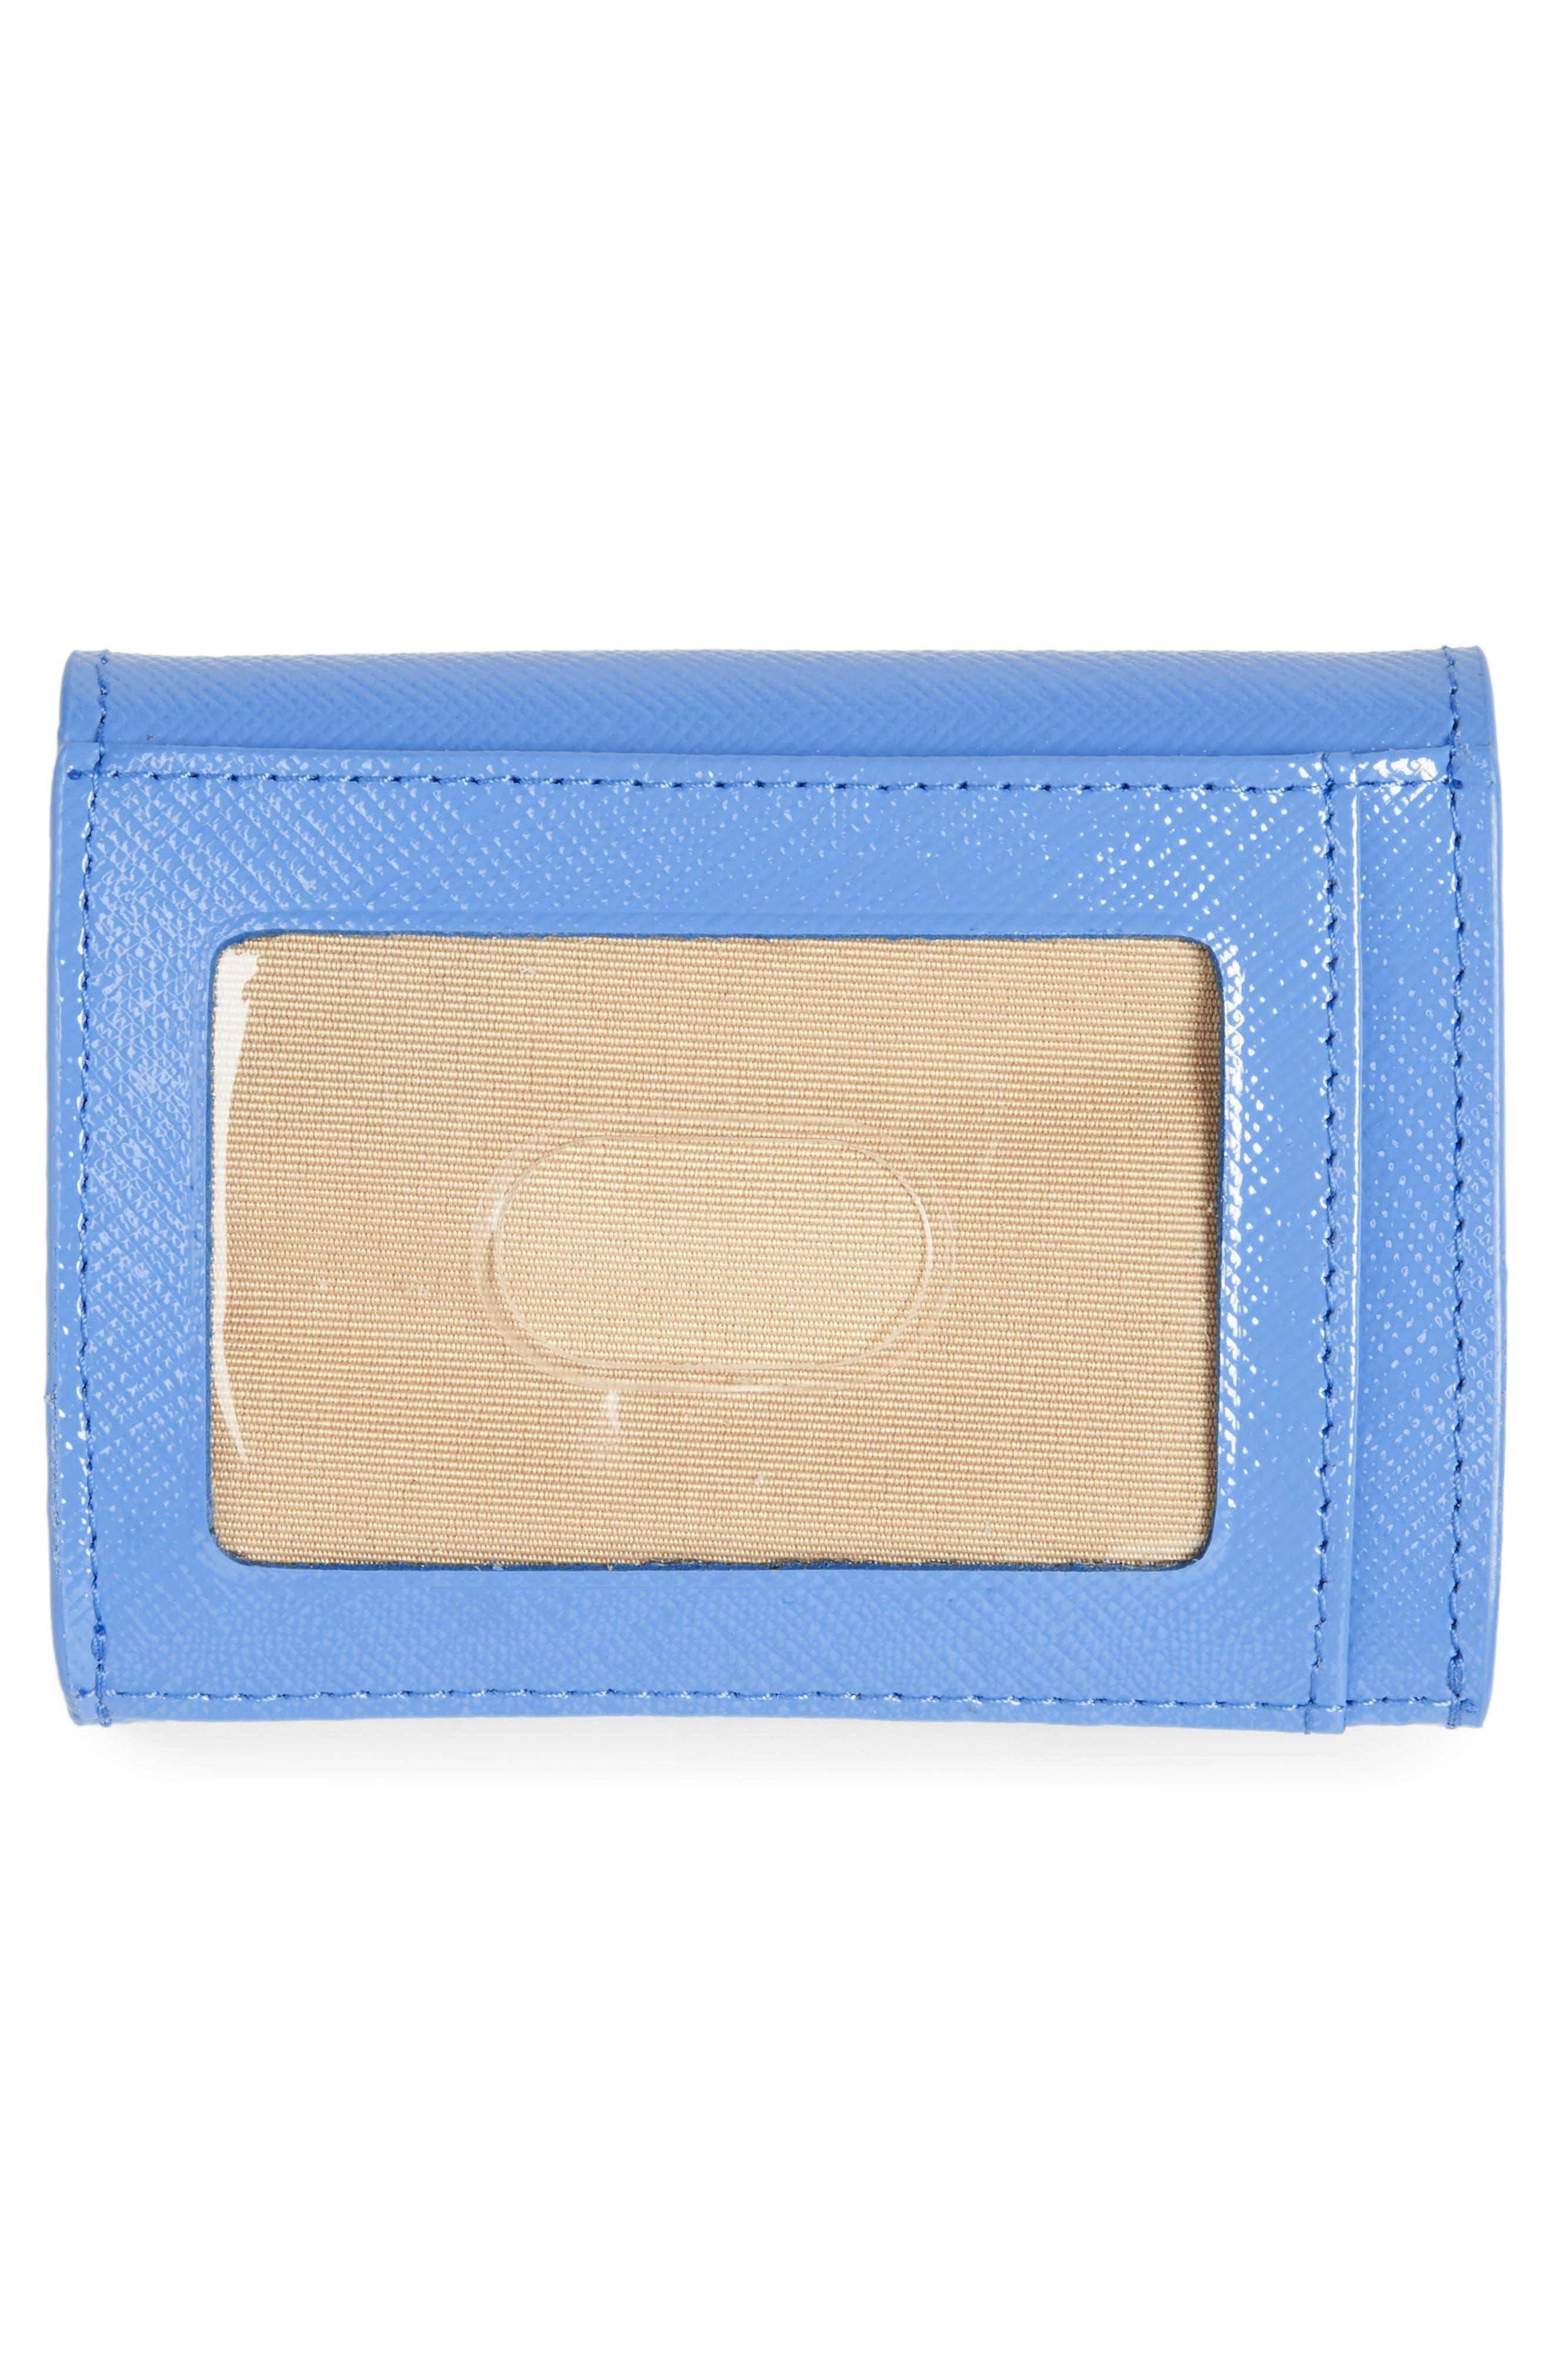 Leather Card Holder,                             Alternate thumbnail 3, color,                             Blue Regatta